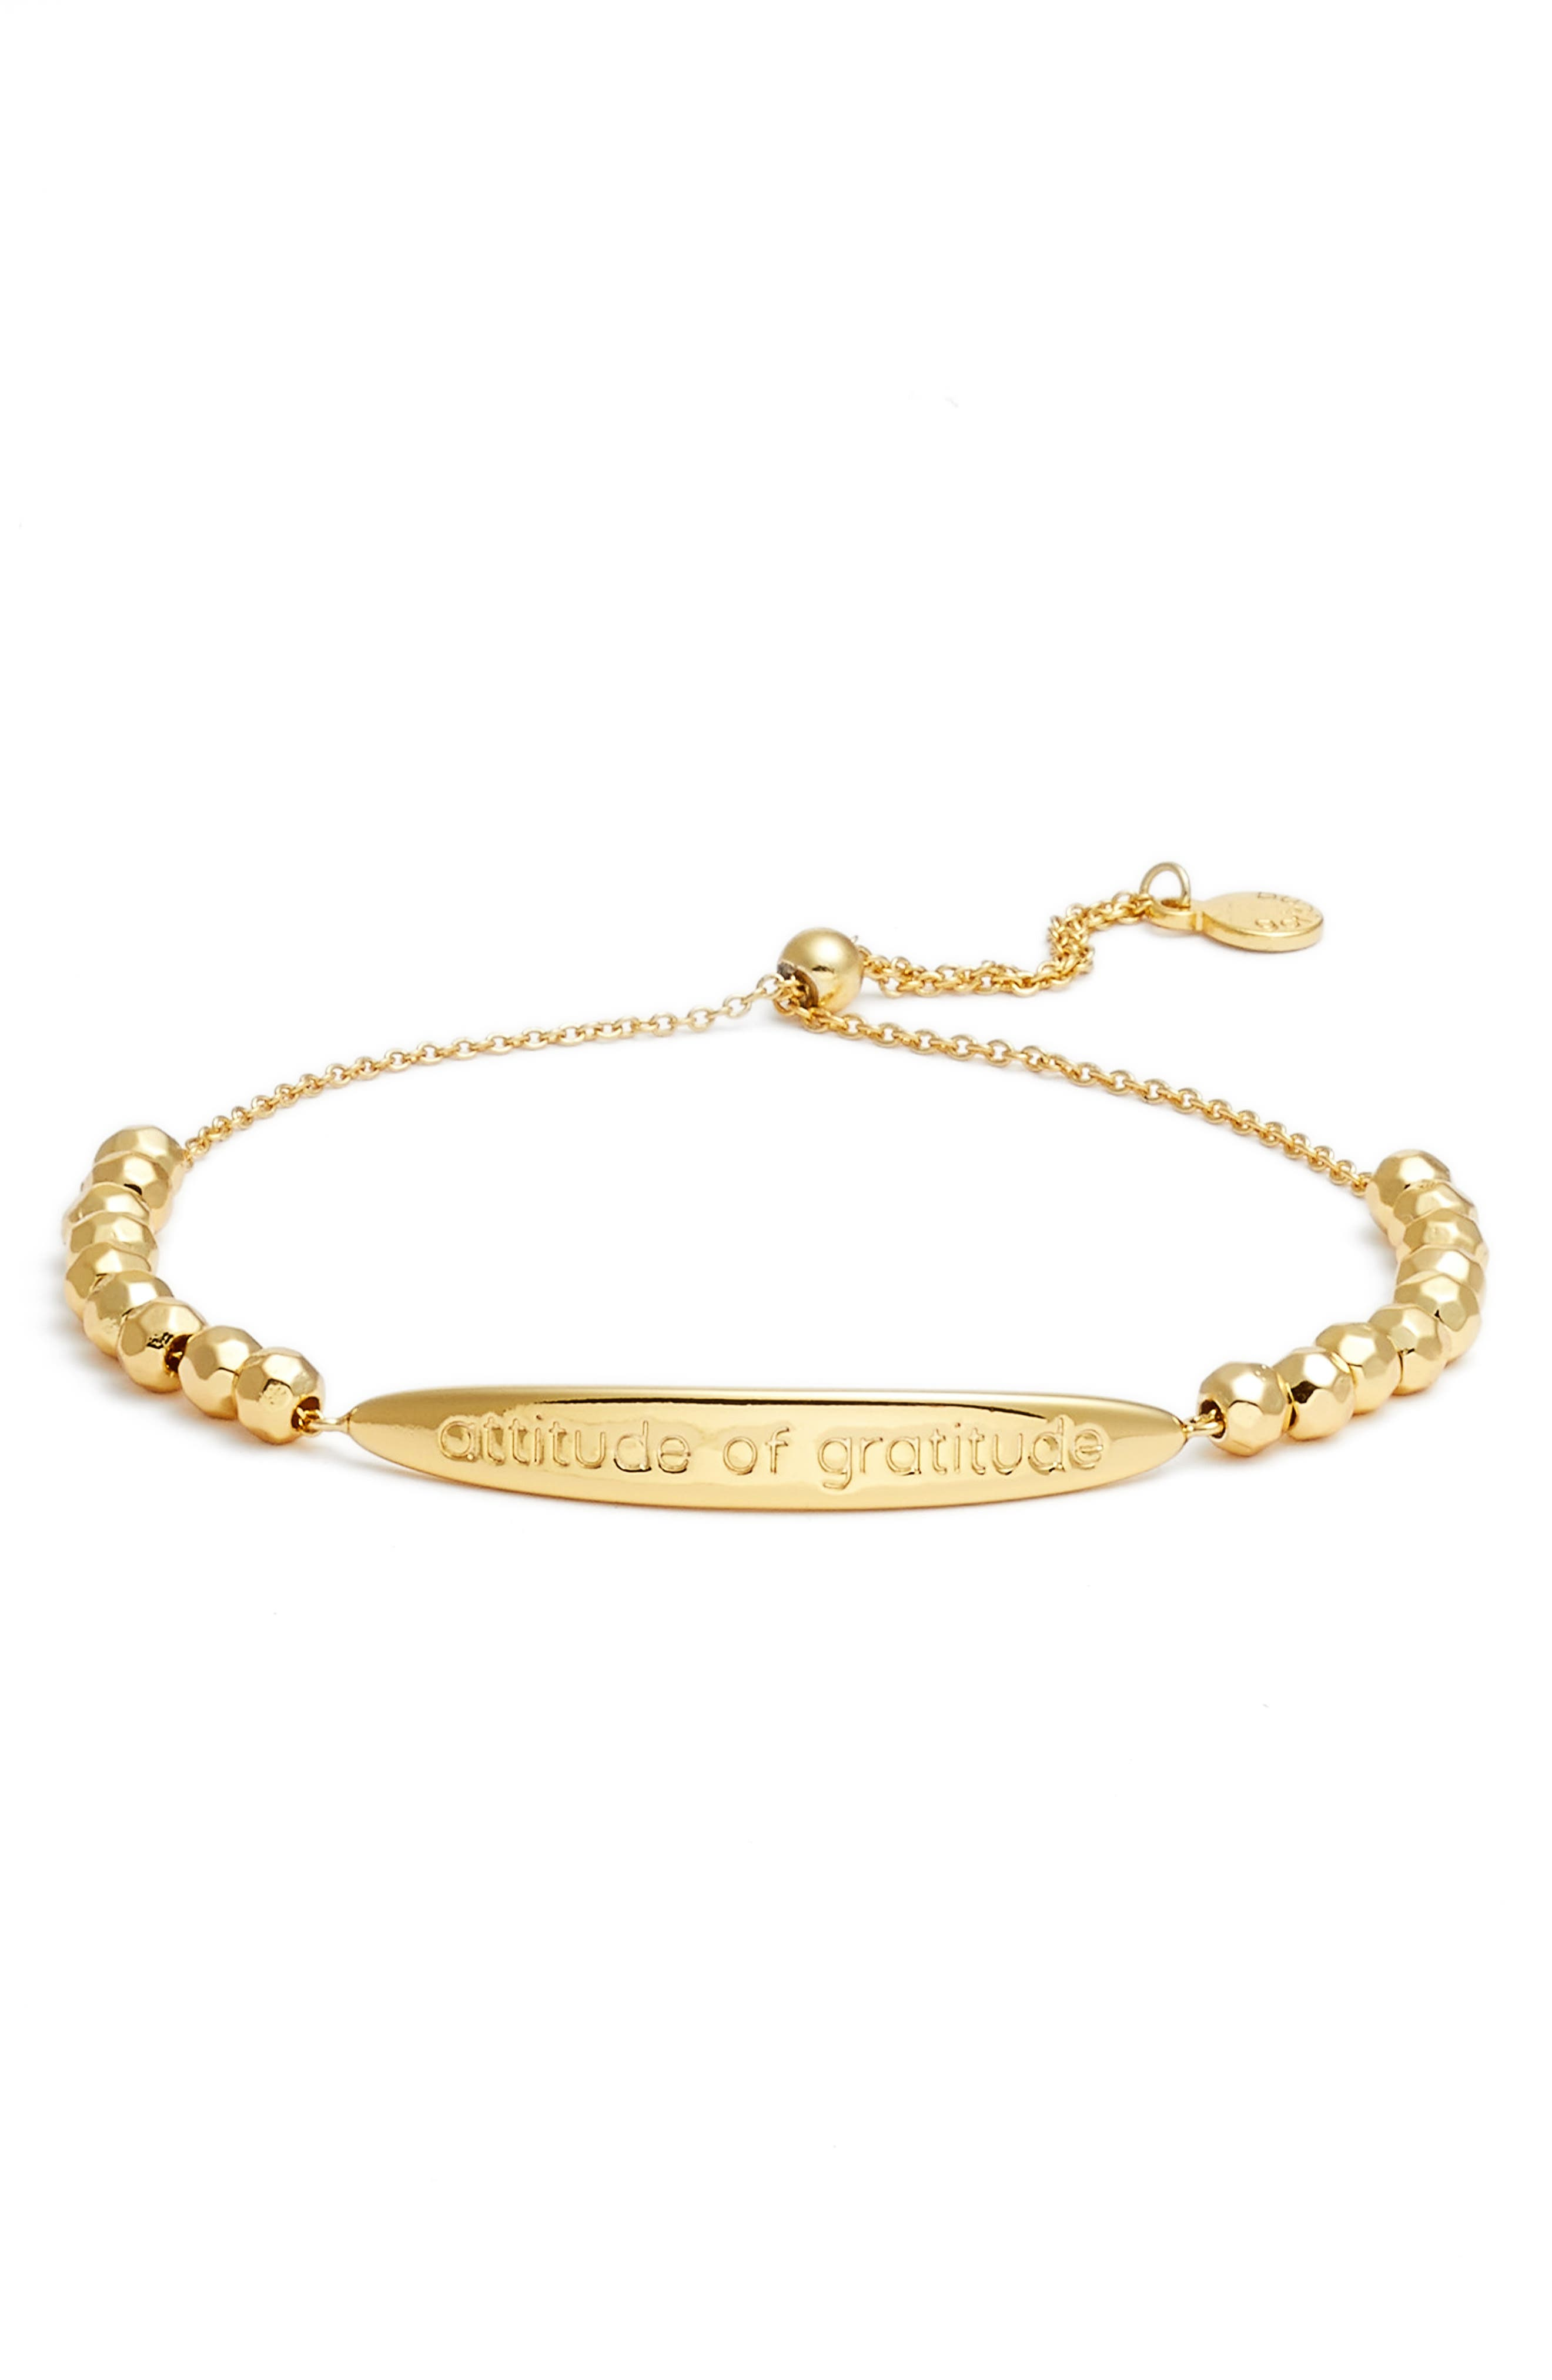 Power Intention Attitude of Gratitude Bangle Bracelet,                         Main,                         color, Gold